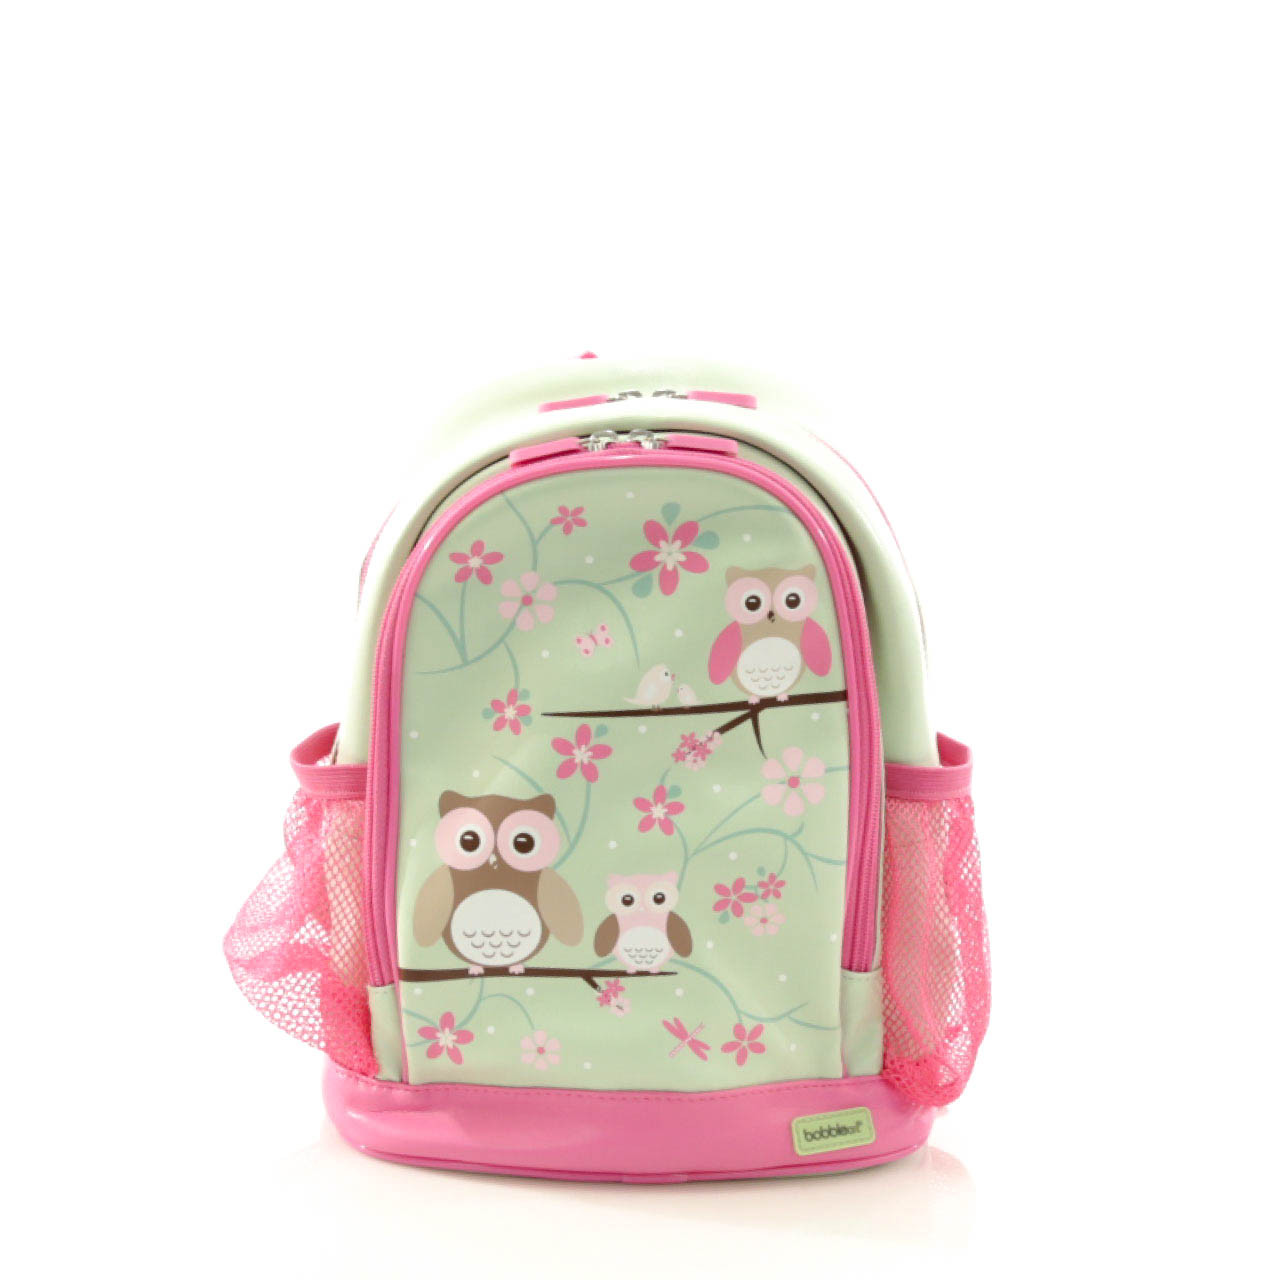 9c5a64b79e Bobble Art Owl Small Poly Vinyl Backpack. Loading zoom